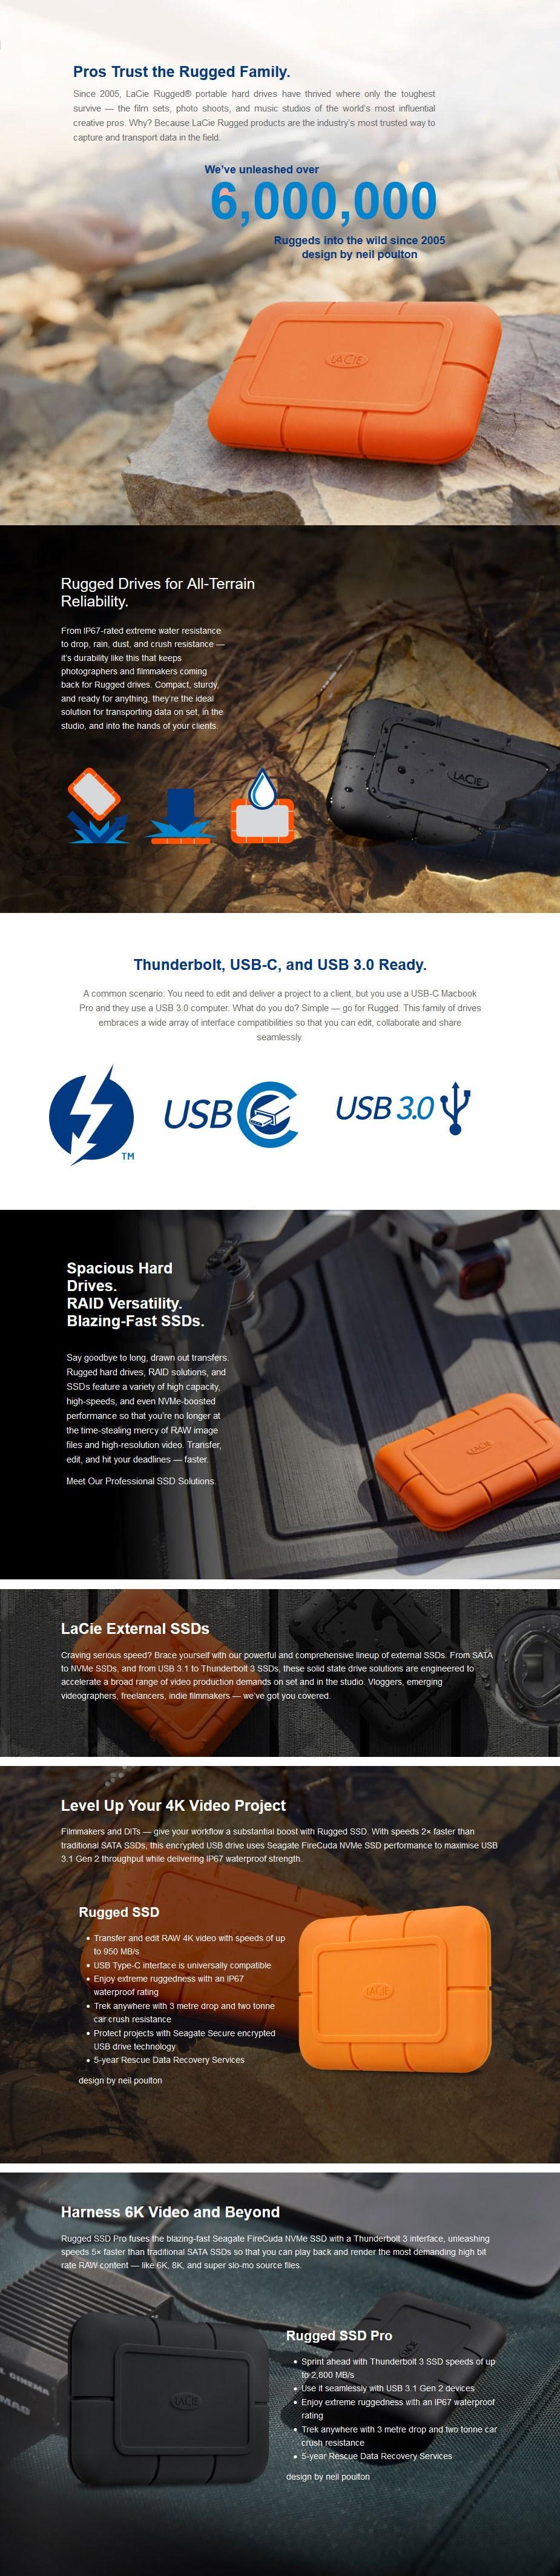 lacie-500gb-rugged-usb-31-gen-2-typec-portable-external-ssd-ac31685-9-2-.jpg